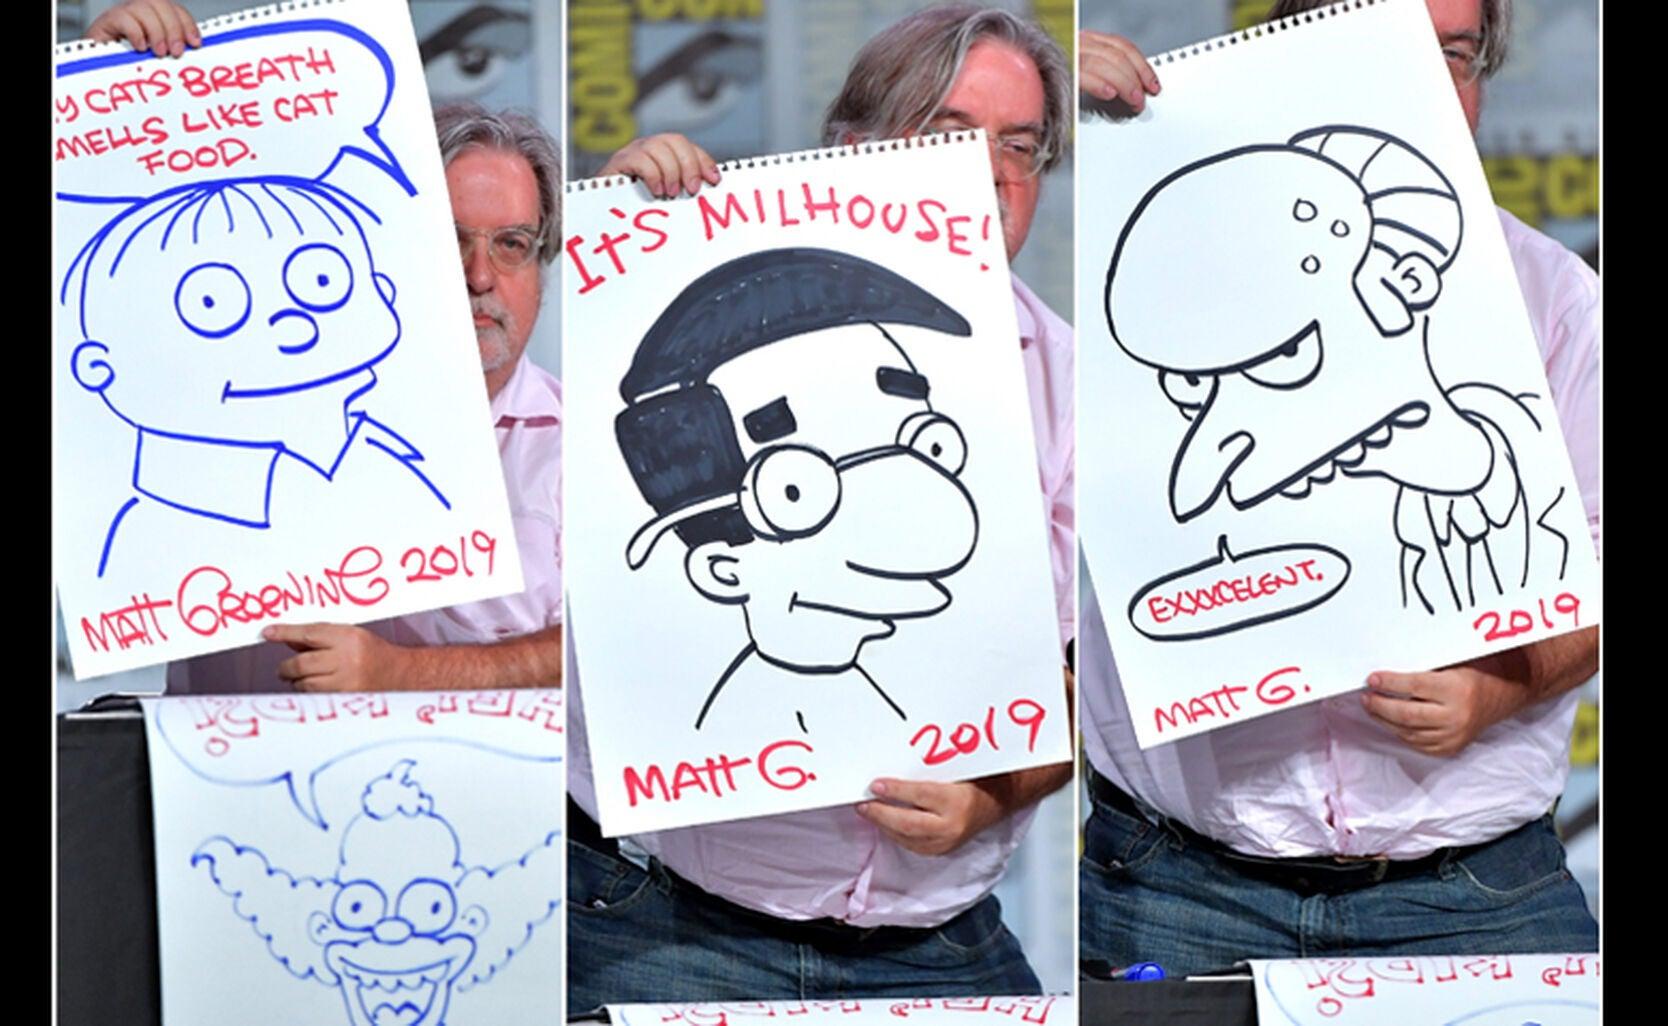 Artist Matt Groening